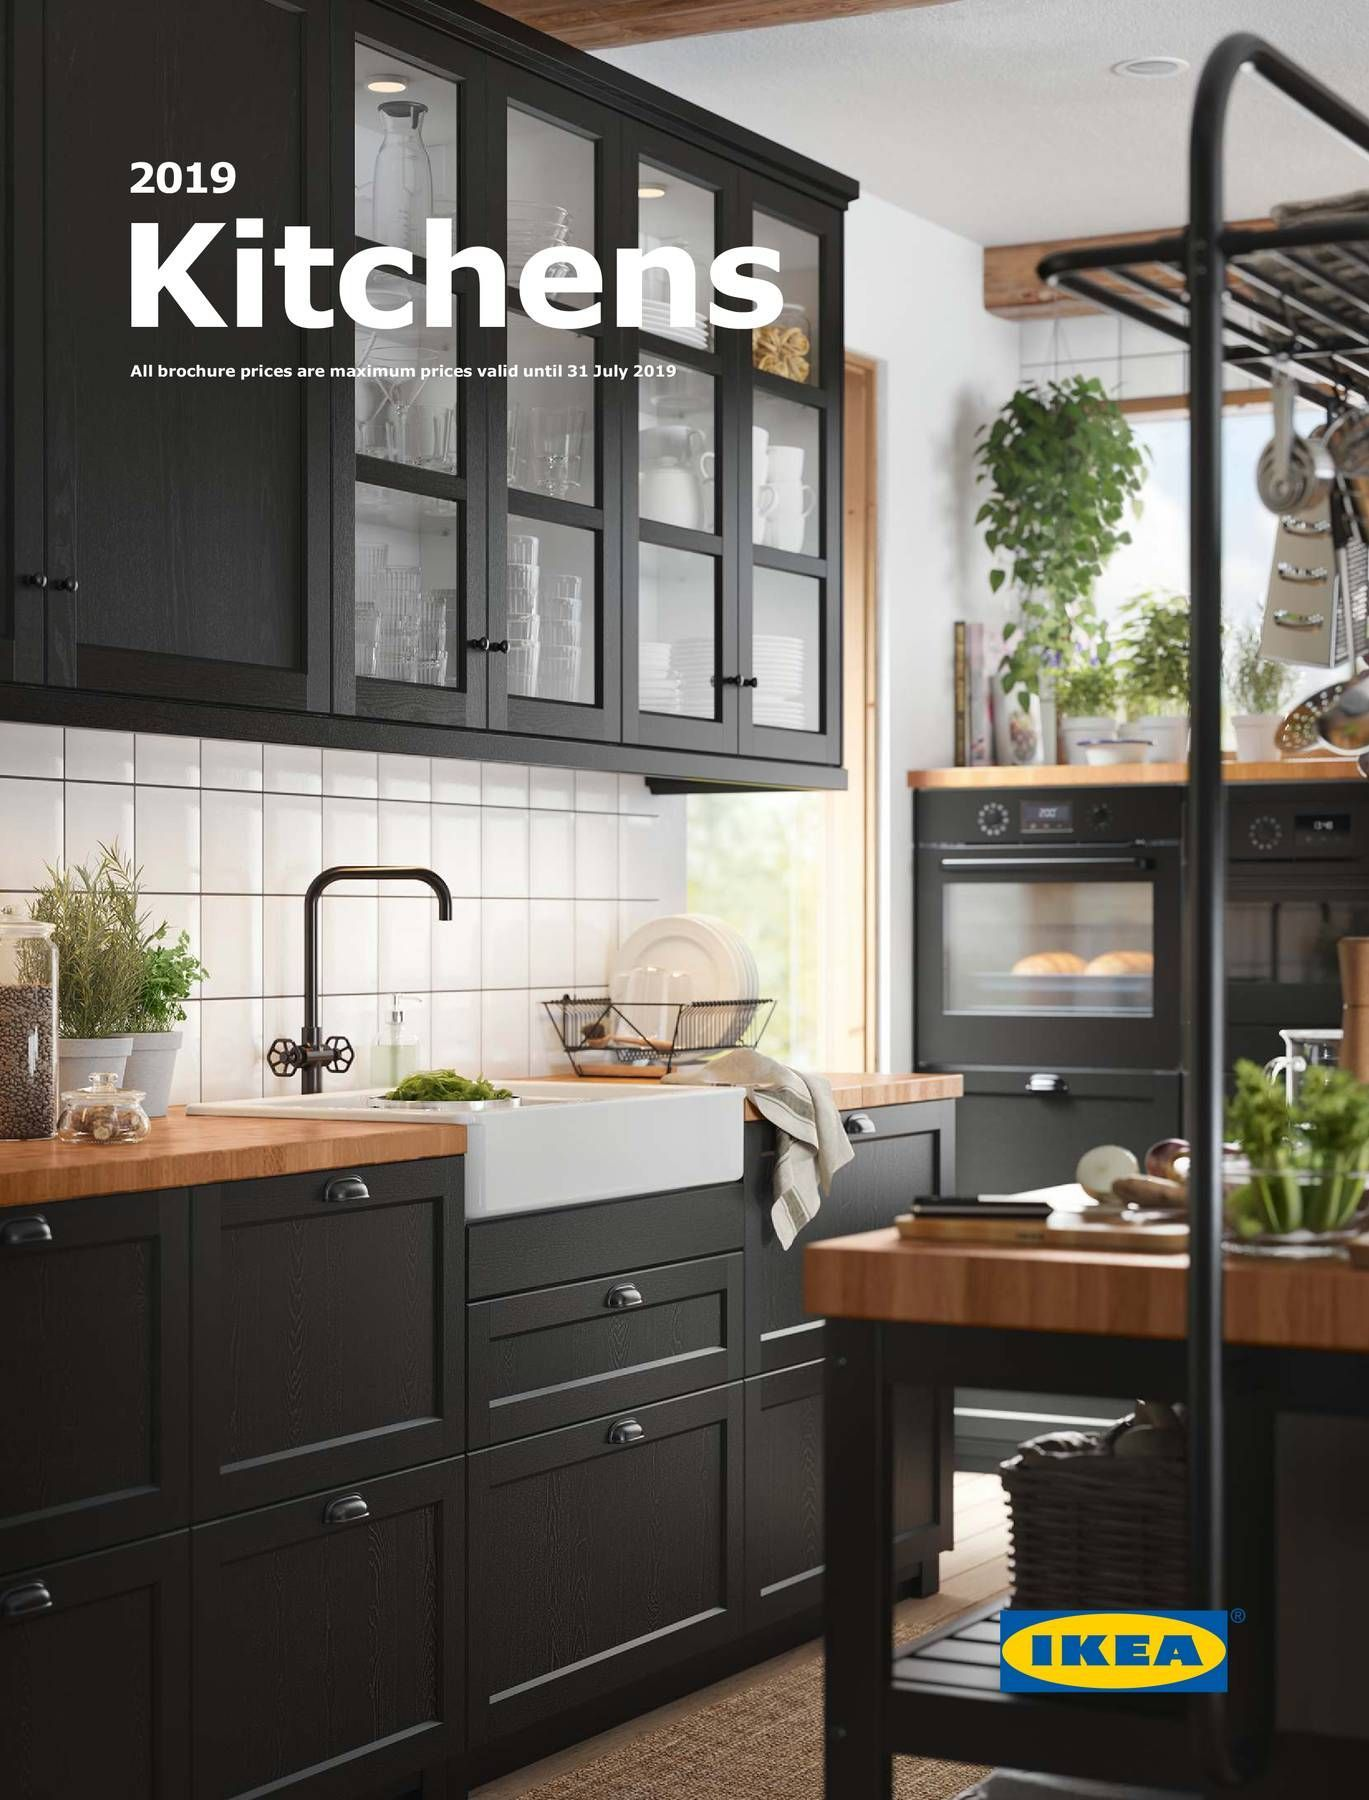 Ikea Kitchen Ideas Kitchen Design Kitchen Inspirations Kitchen Renovation